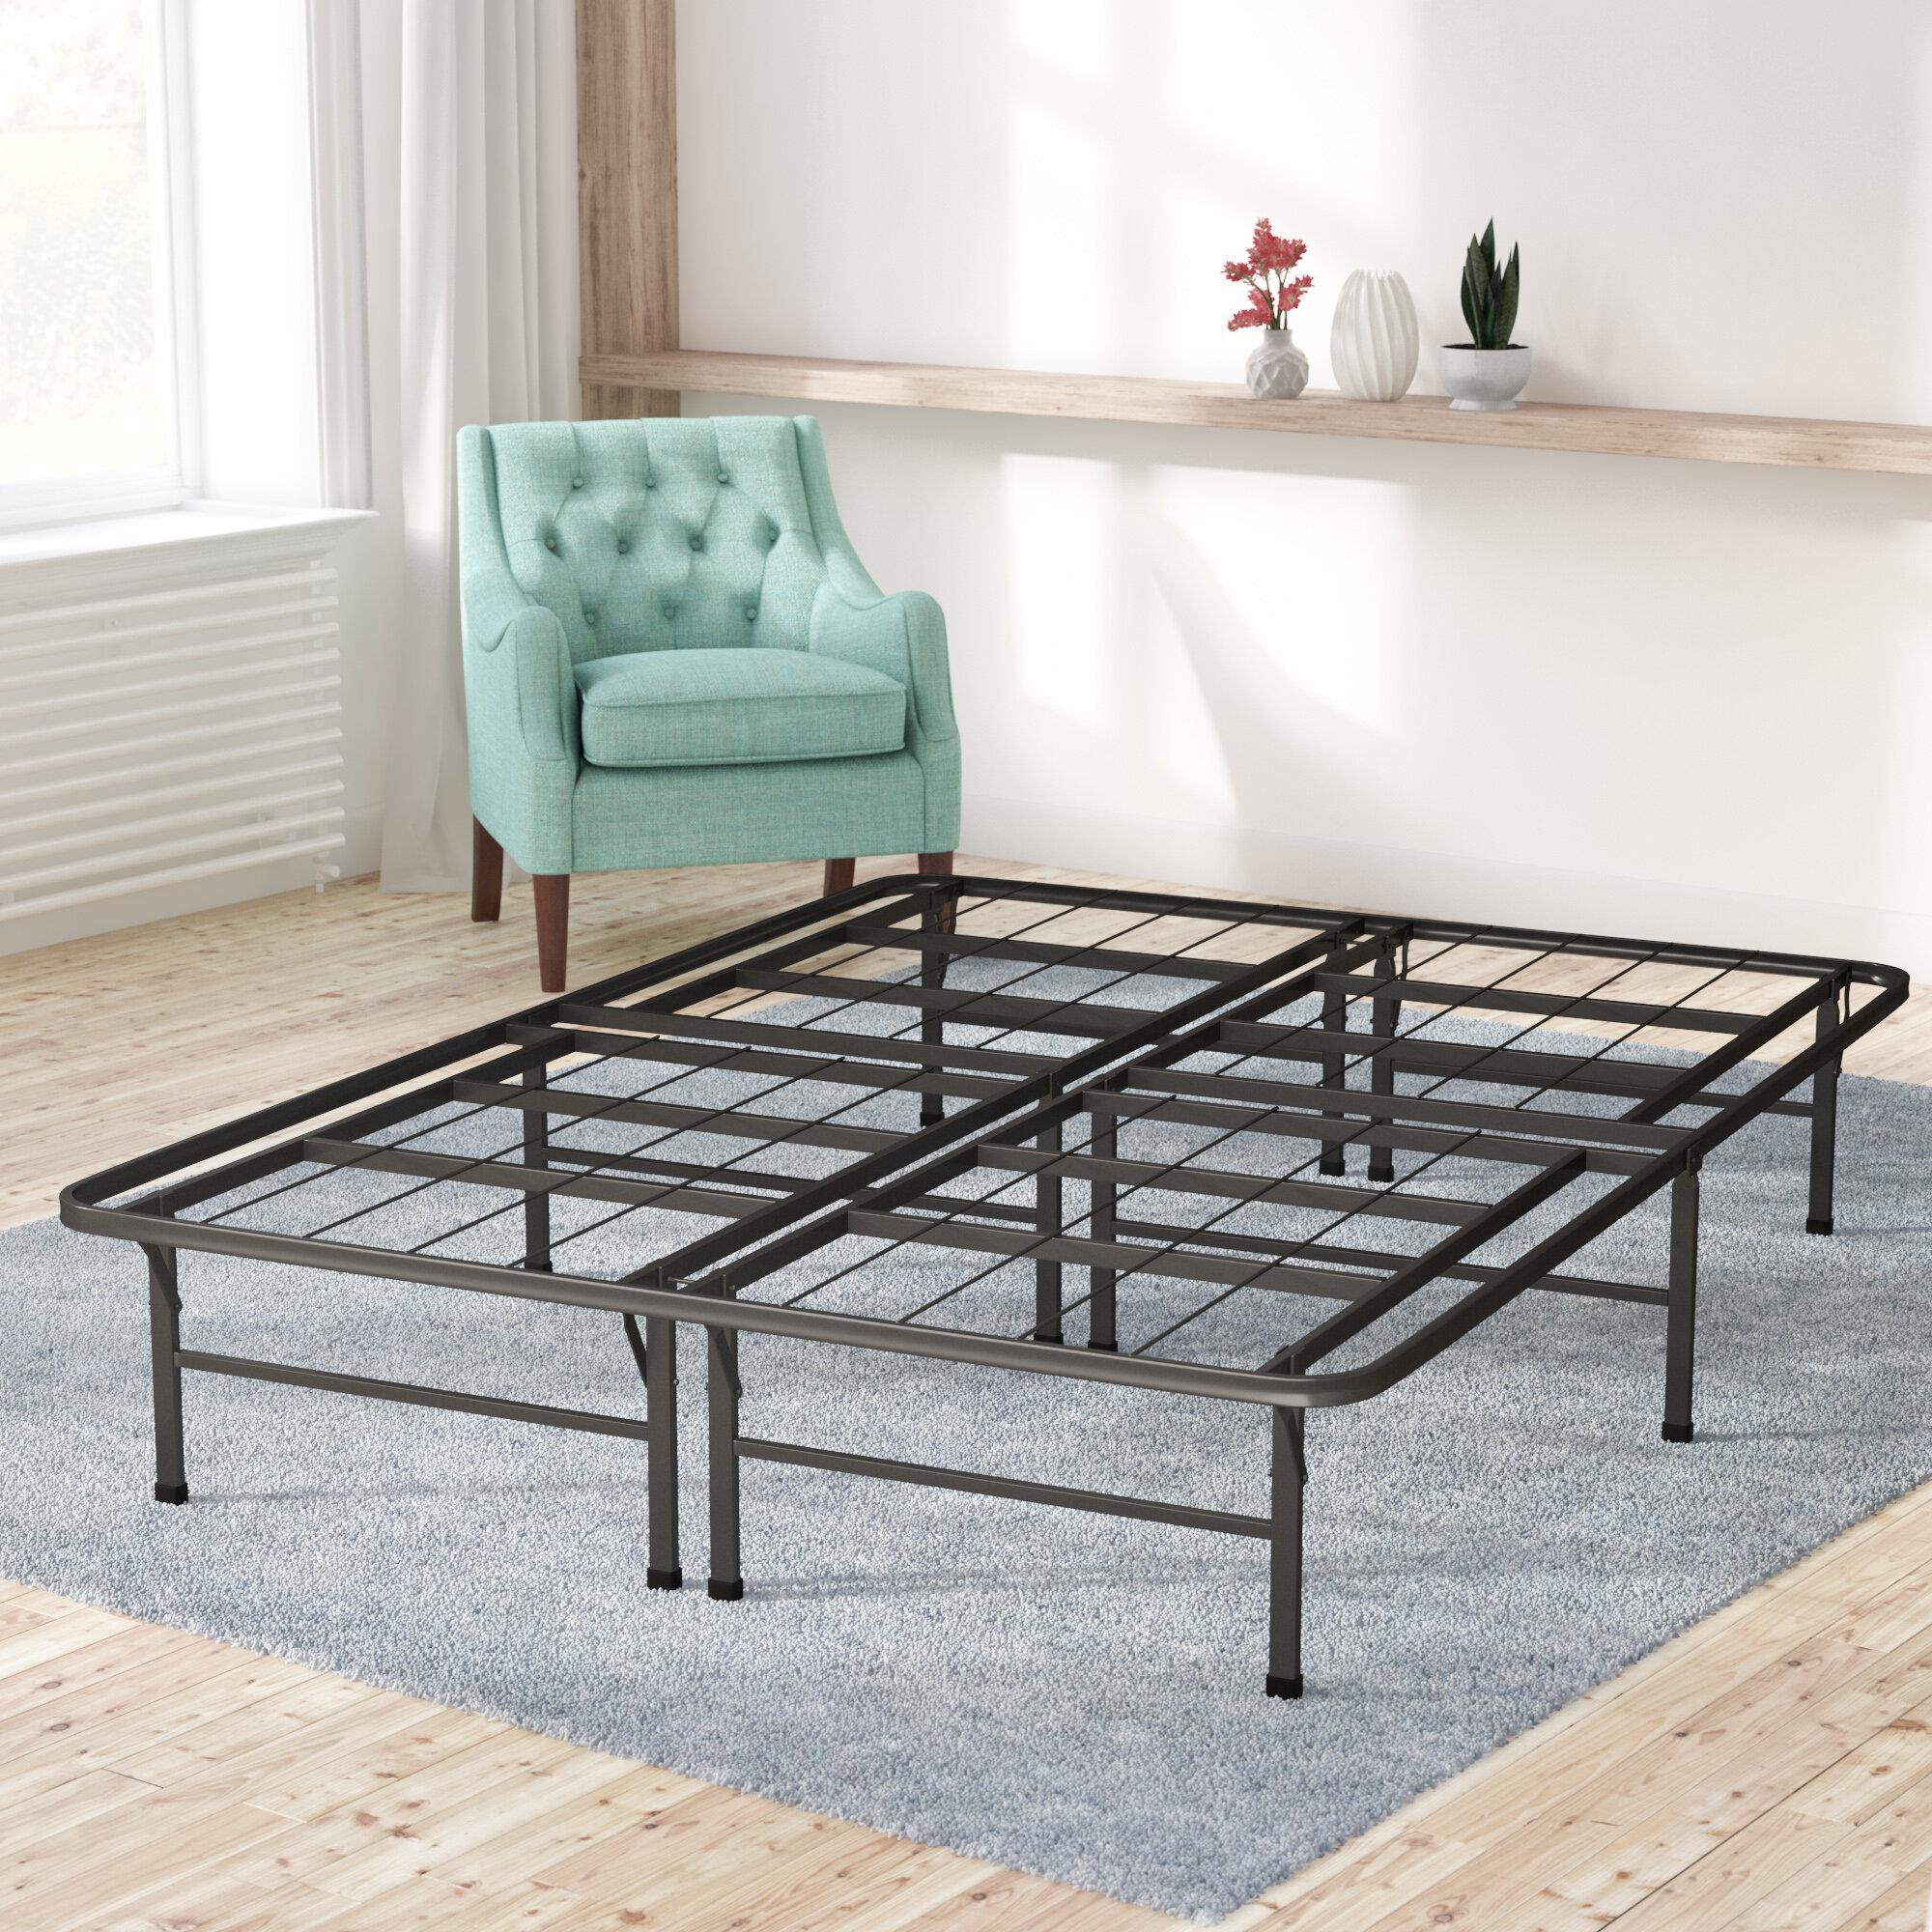 Alwyn Home Box Spring & Bed Frame Foundation & Reviews | Wayfair